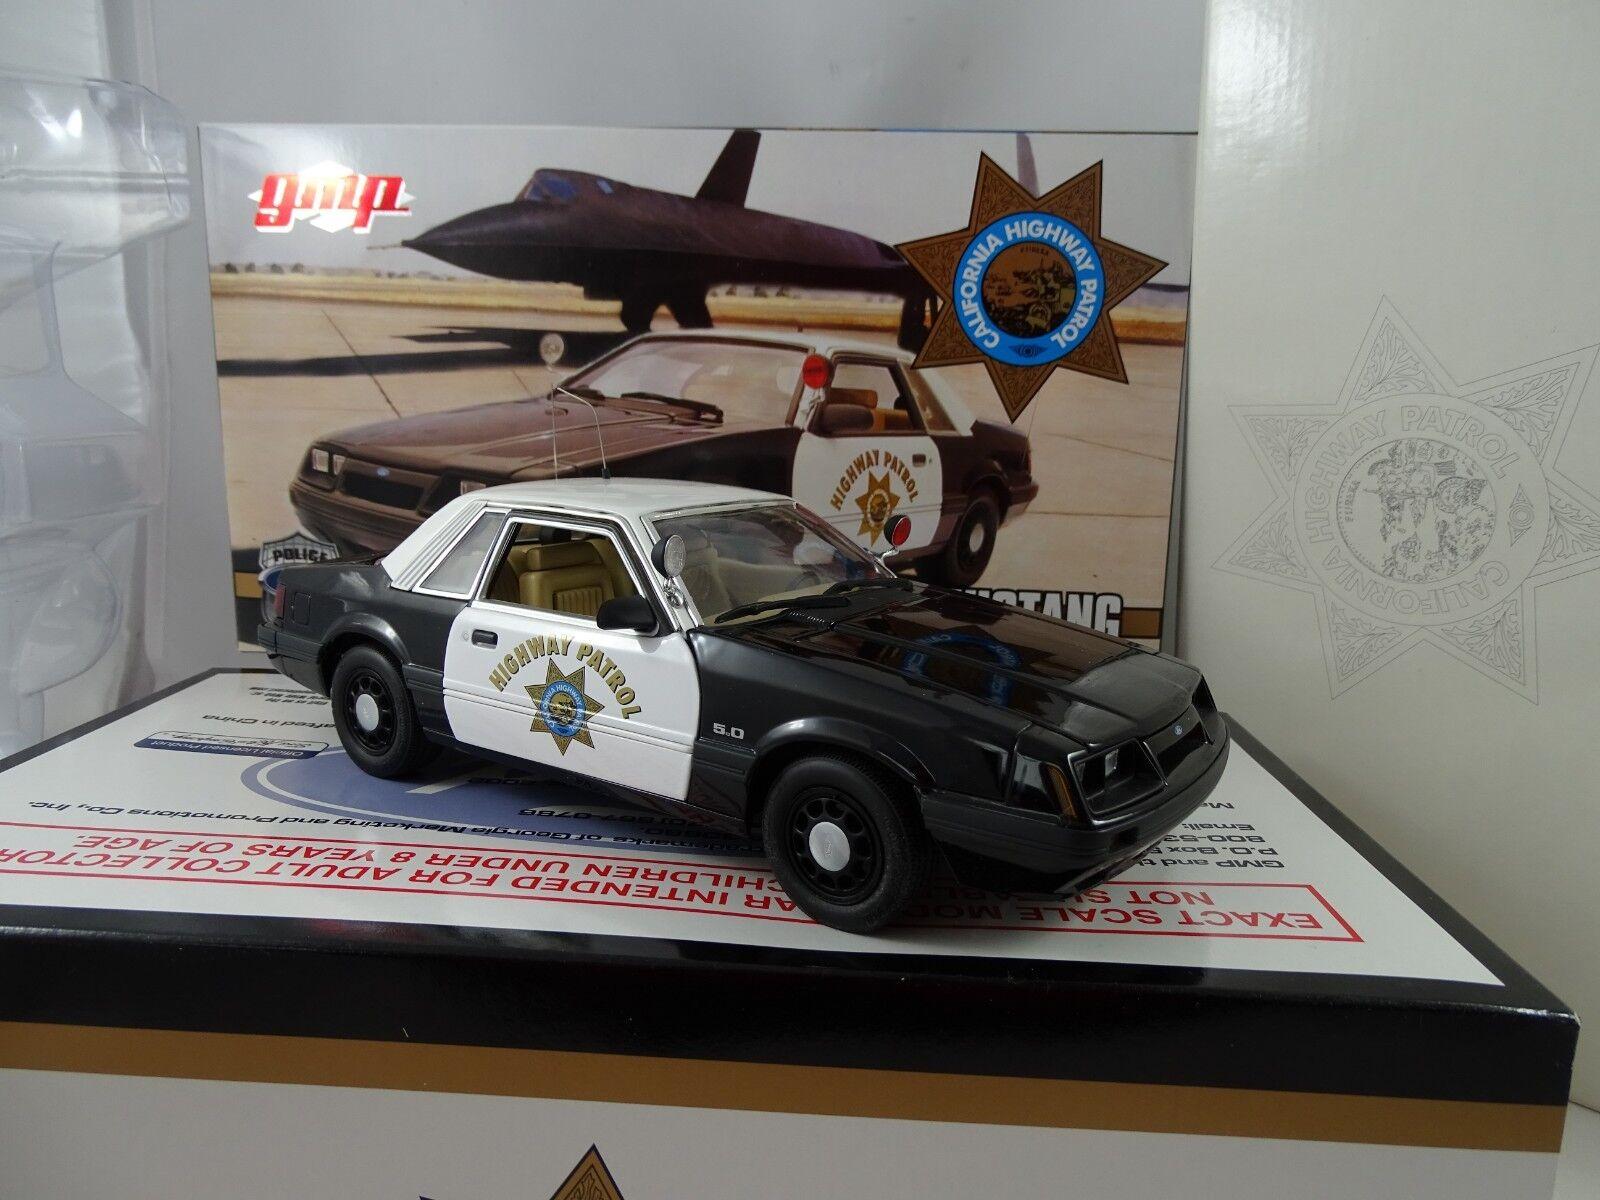 1:18 GMP #9065 - 1985 FORD MUSTANG California Highway Patrol-rarità §